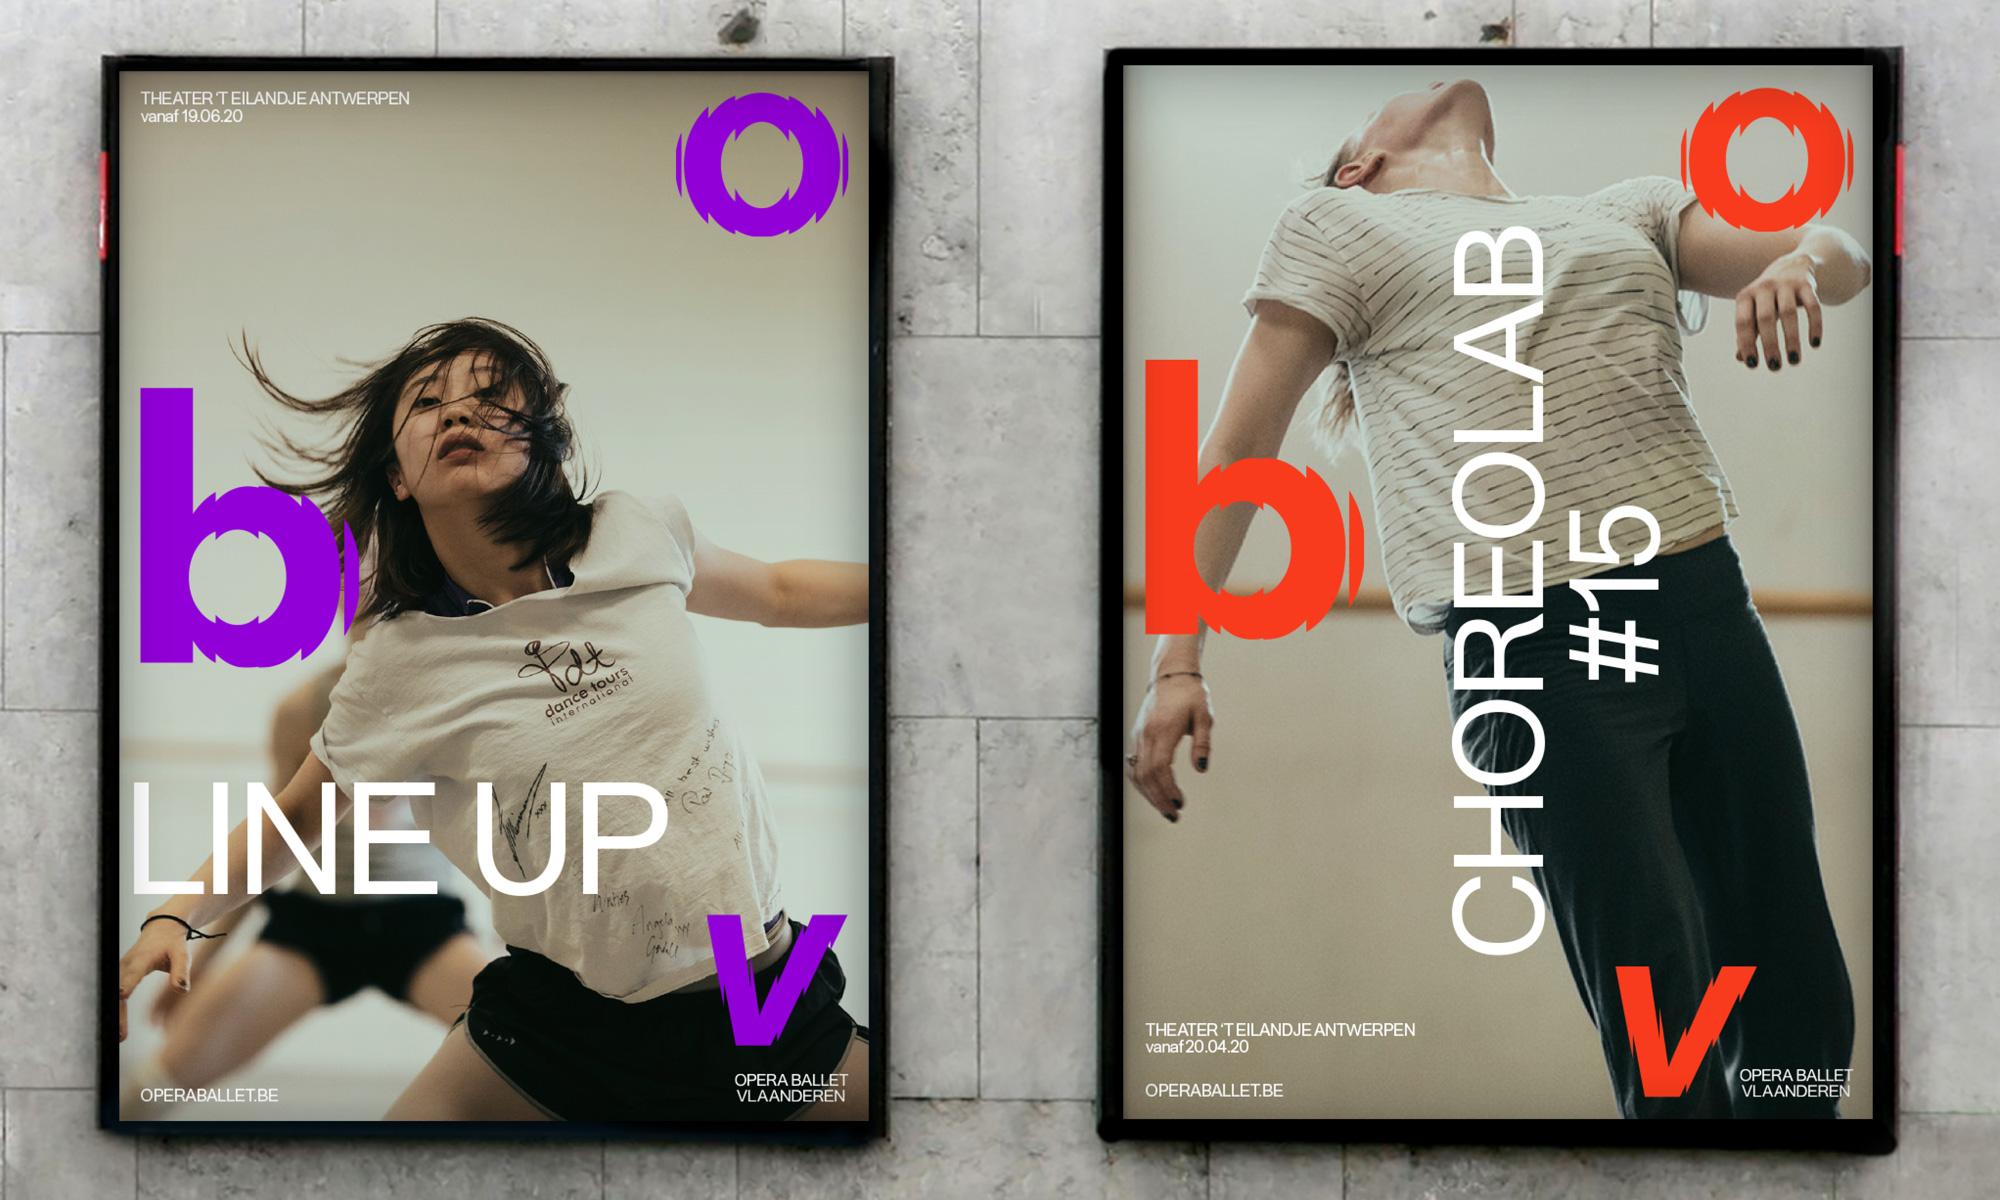 New Logo and Identity for Opera Ballet Vlaanderen by Pentagram